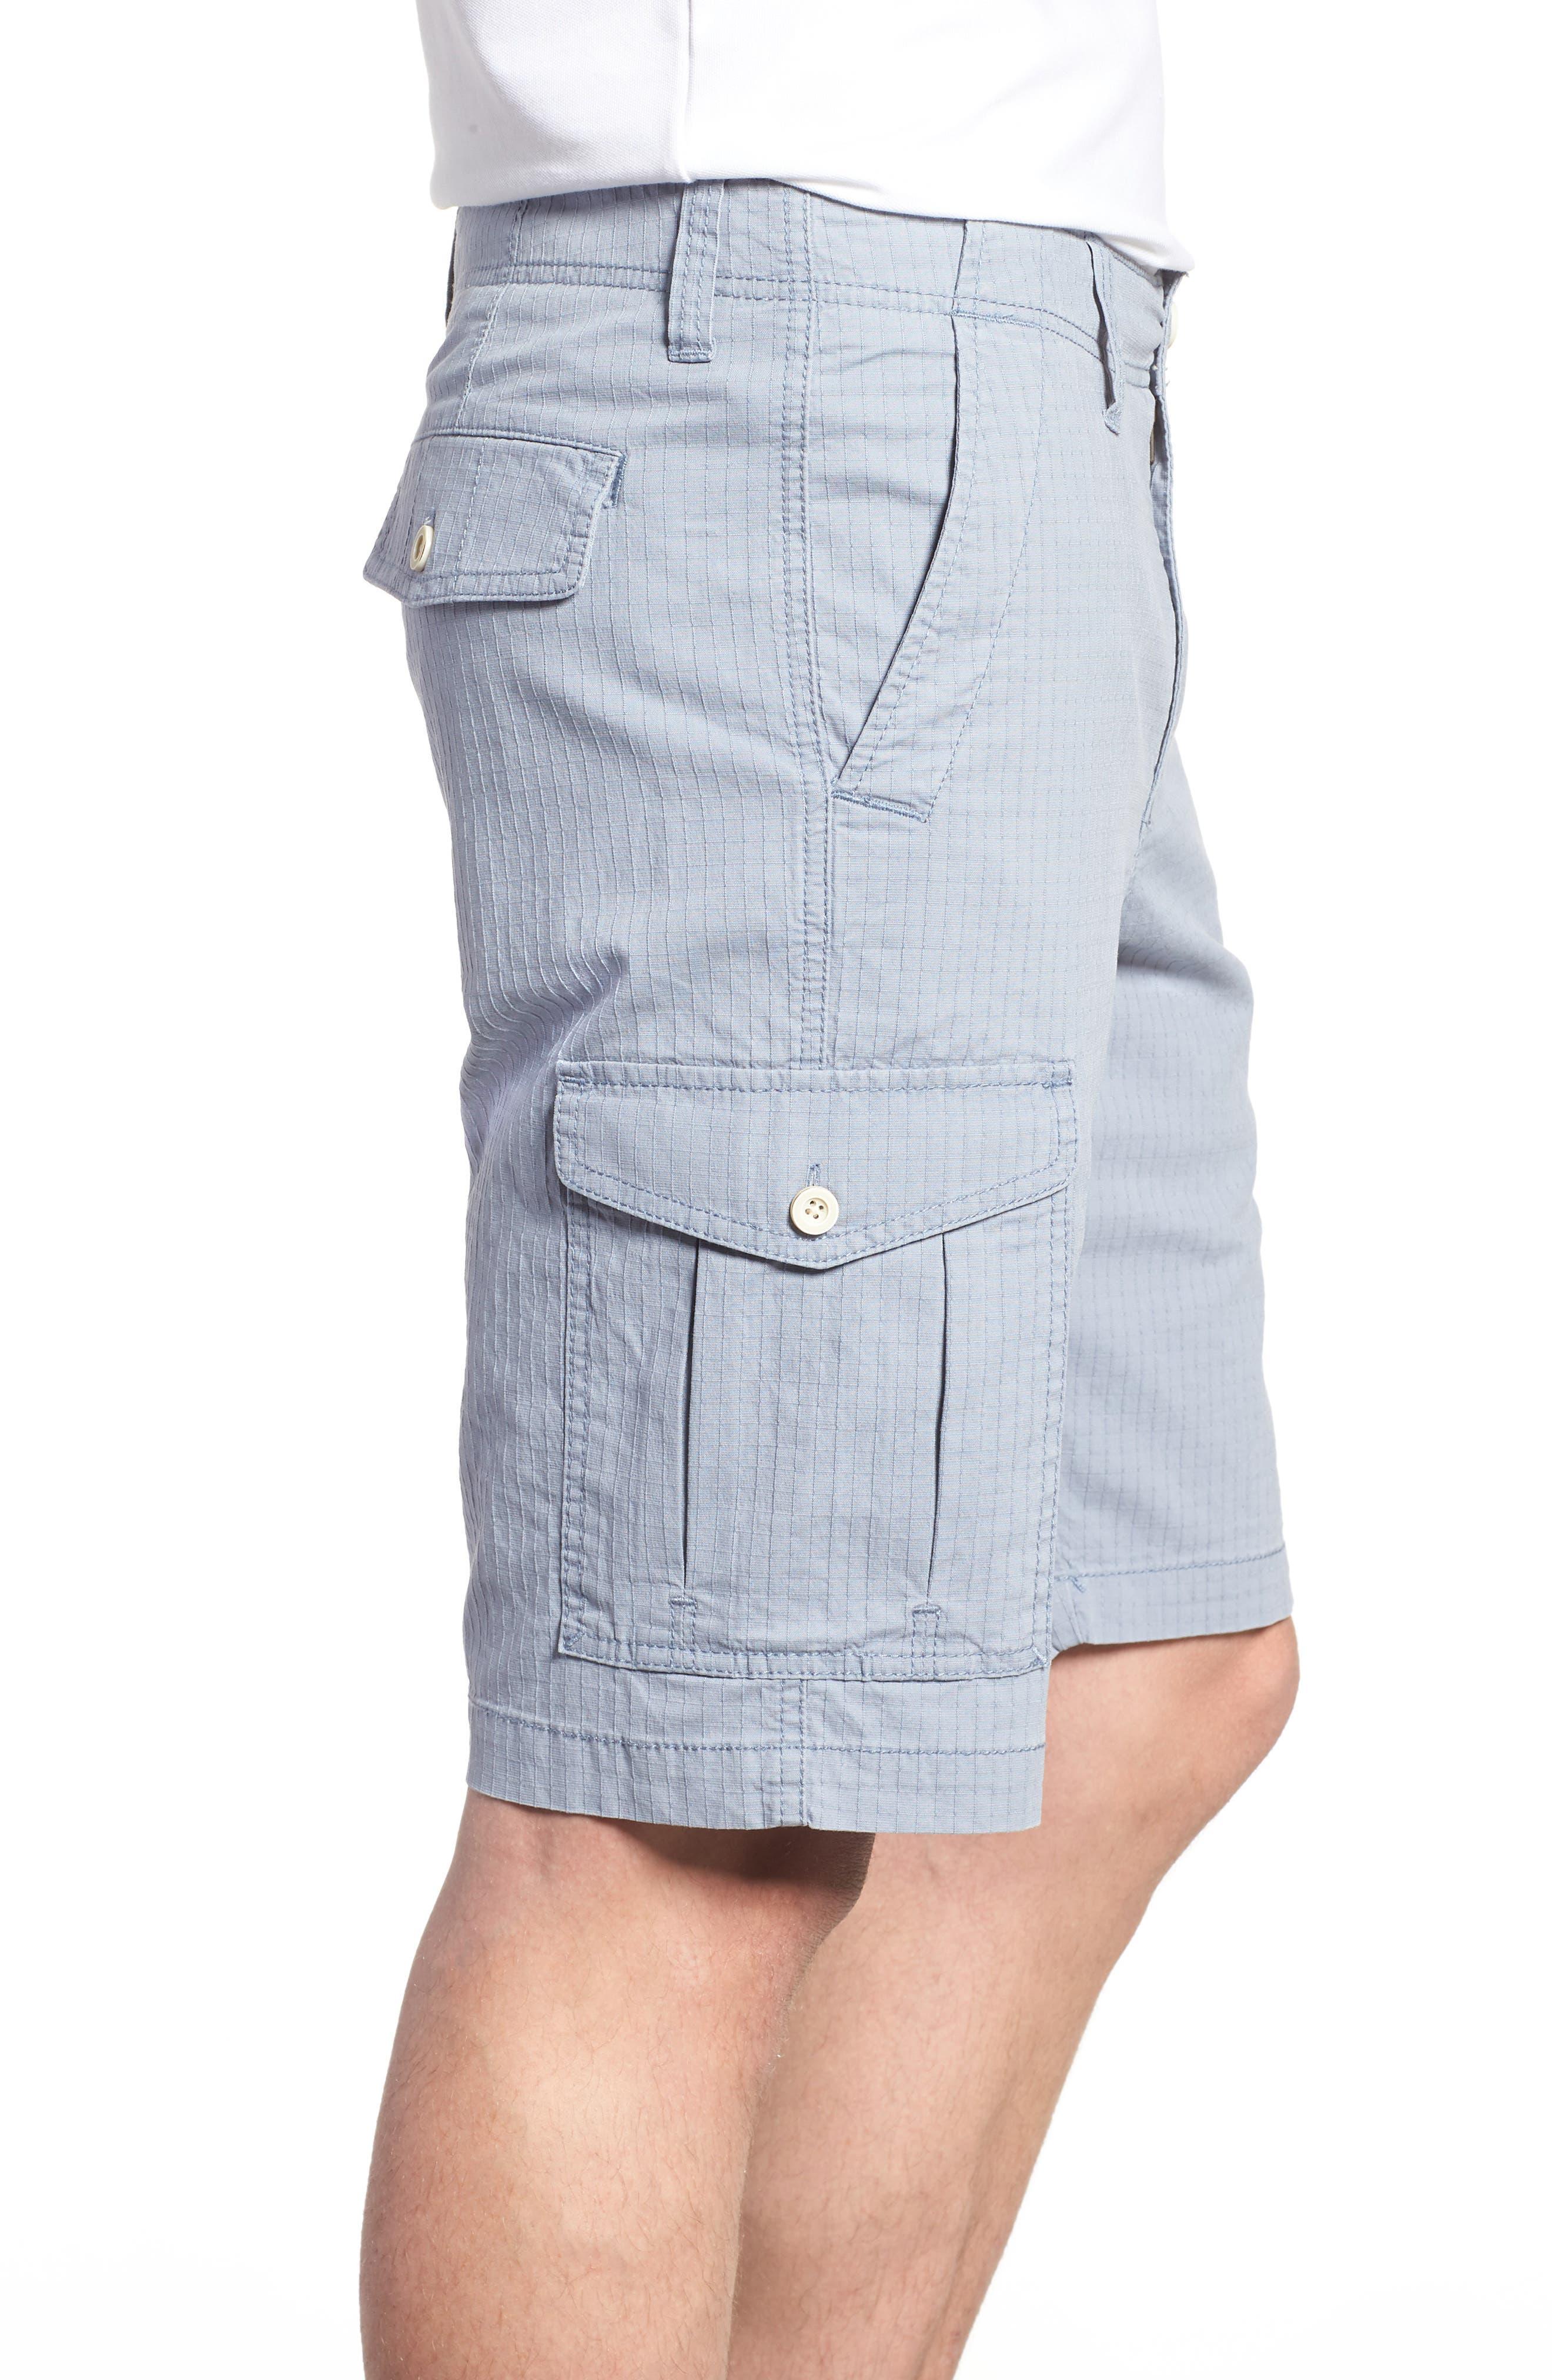 Sandbar Ripstop Cargo Shorts,                             Alternate thumbnail 3, color,                             401